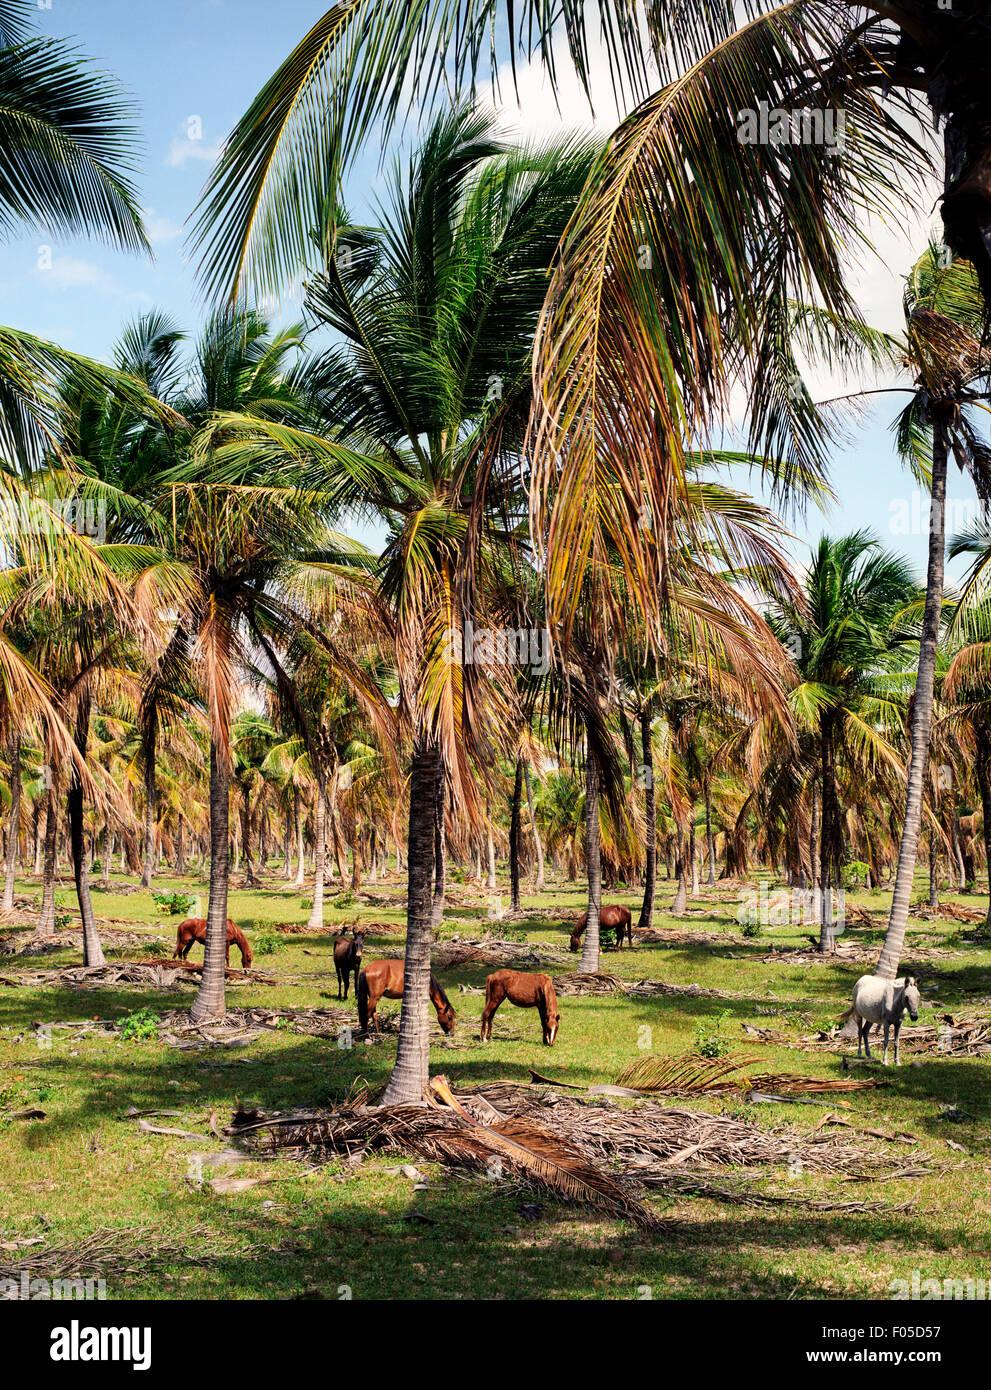 Horses graze in a field of palm trees, near Jericoacara Brazil Northern Brazil - Stock Image